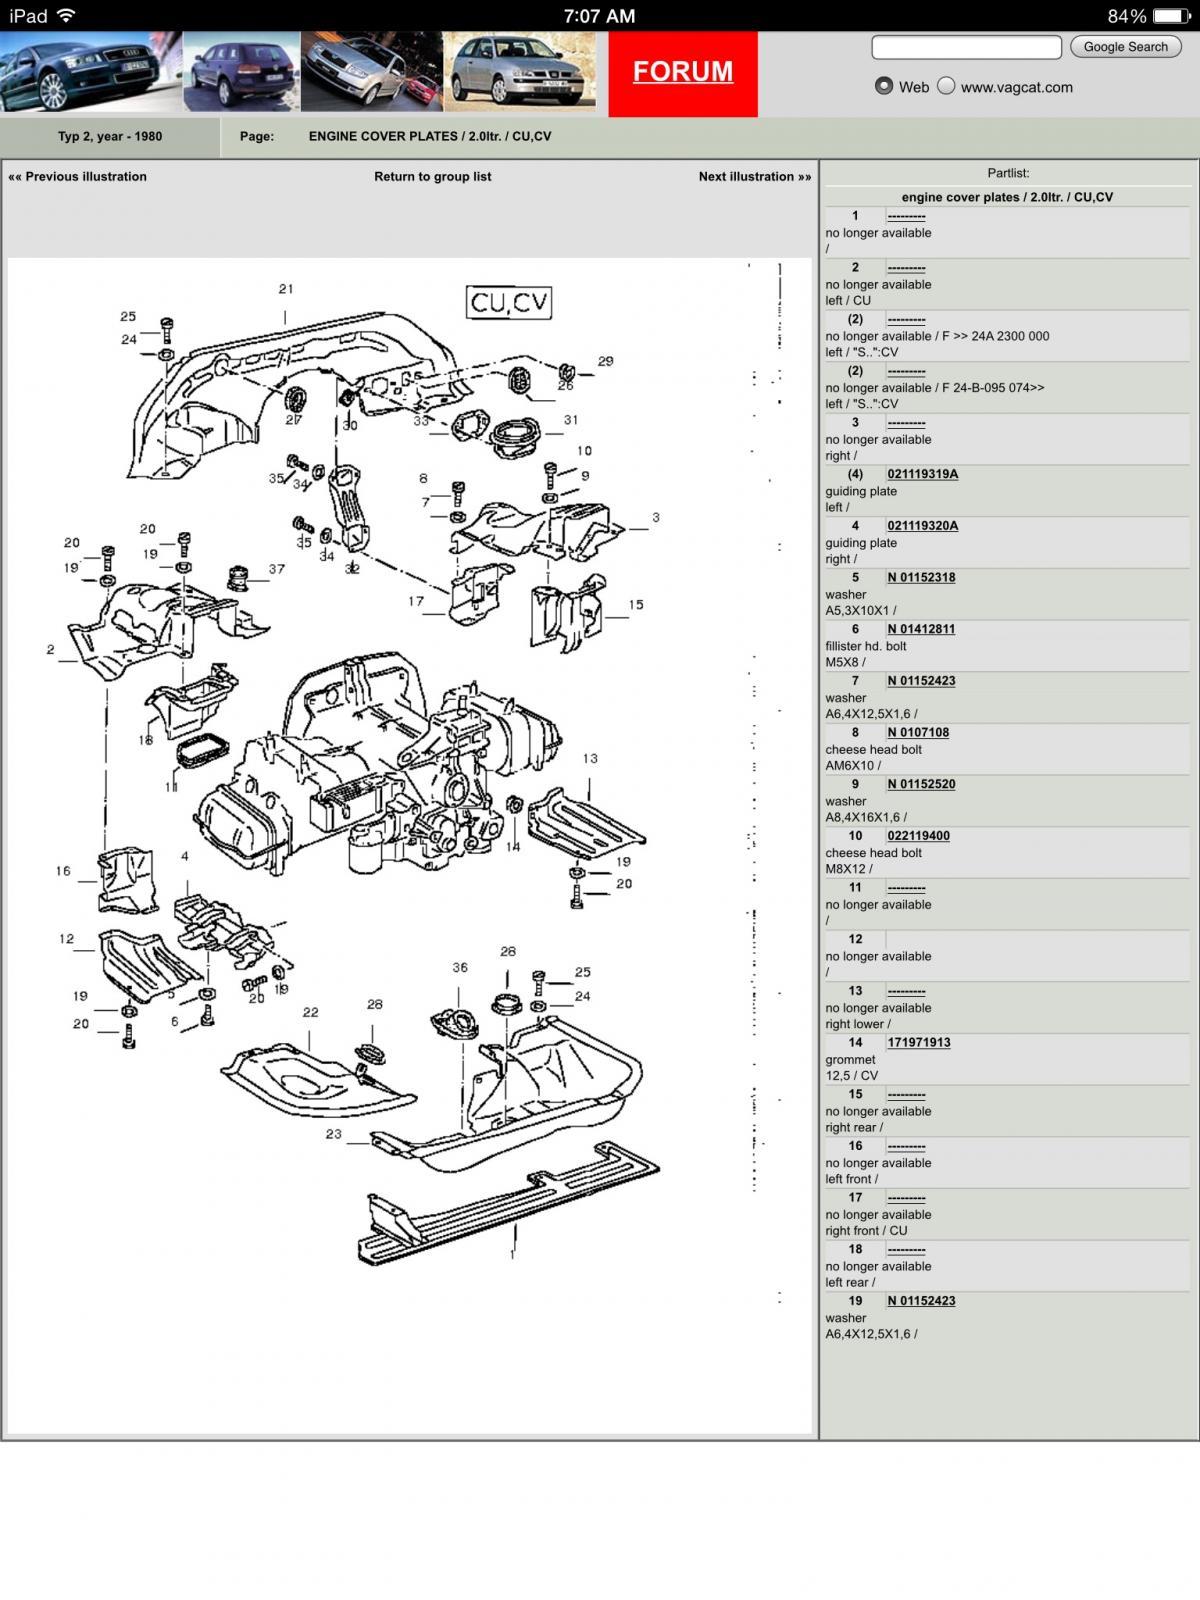 [SCHEMATICS_48IU]  EW_3059] Vw Engine Tin Diagram Together With 1974 Vw Beetle Wiring Diagram  Free Diagram   Vw 1600 Bus Engine Tin Diagram      Cette Gritea Mohammedshrine Librar Wiring 101